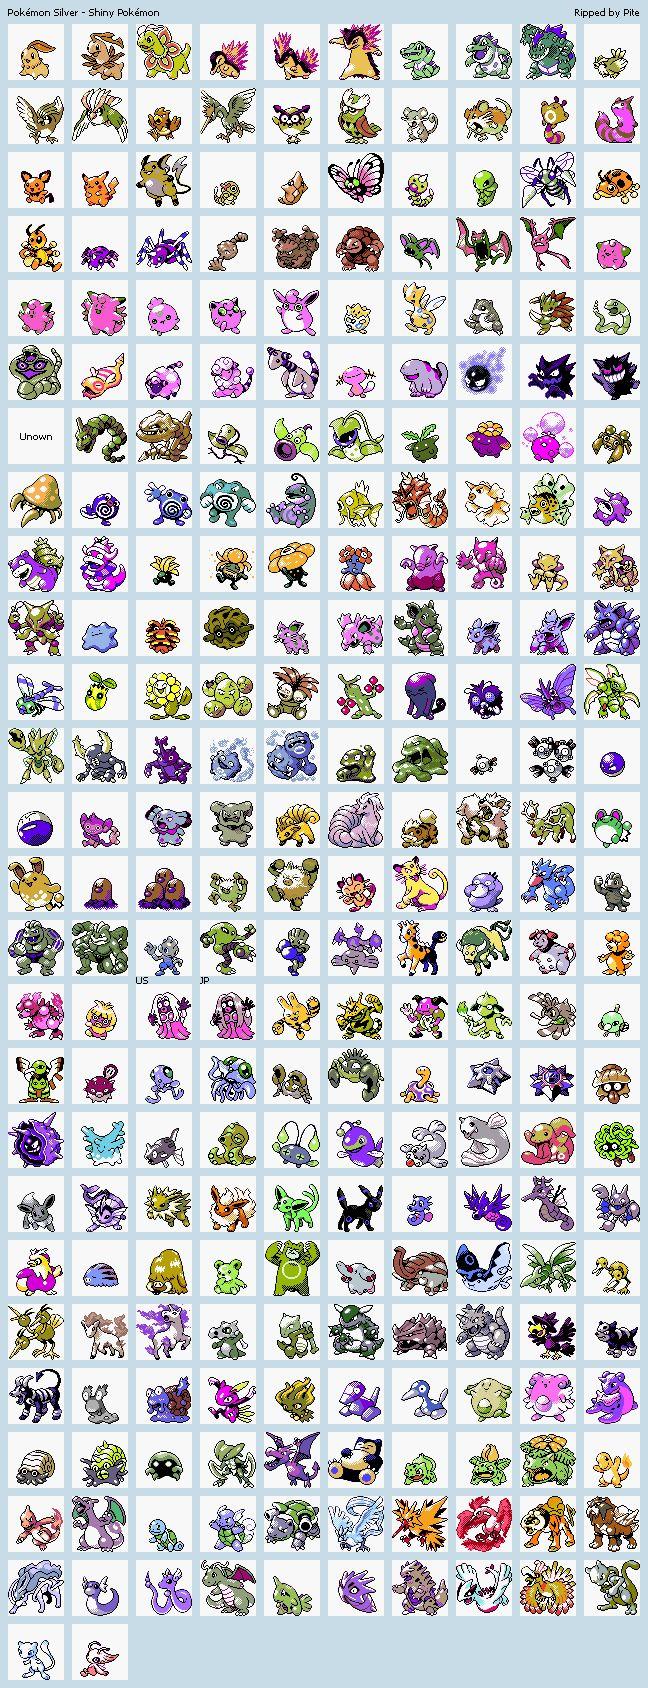 Pokemon (Silver Version, Shiny)